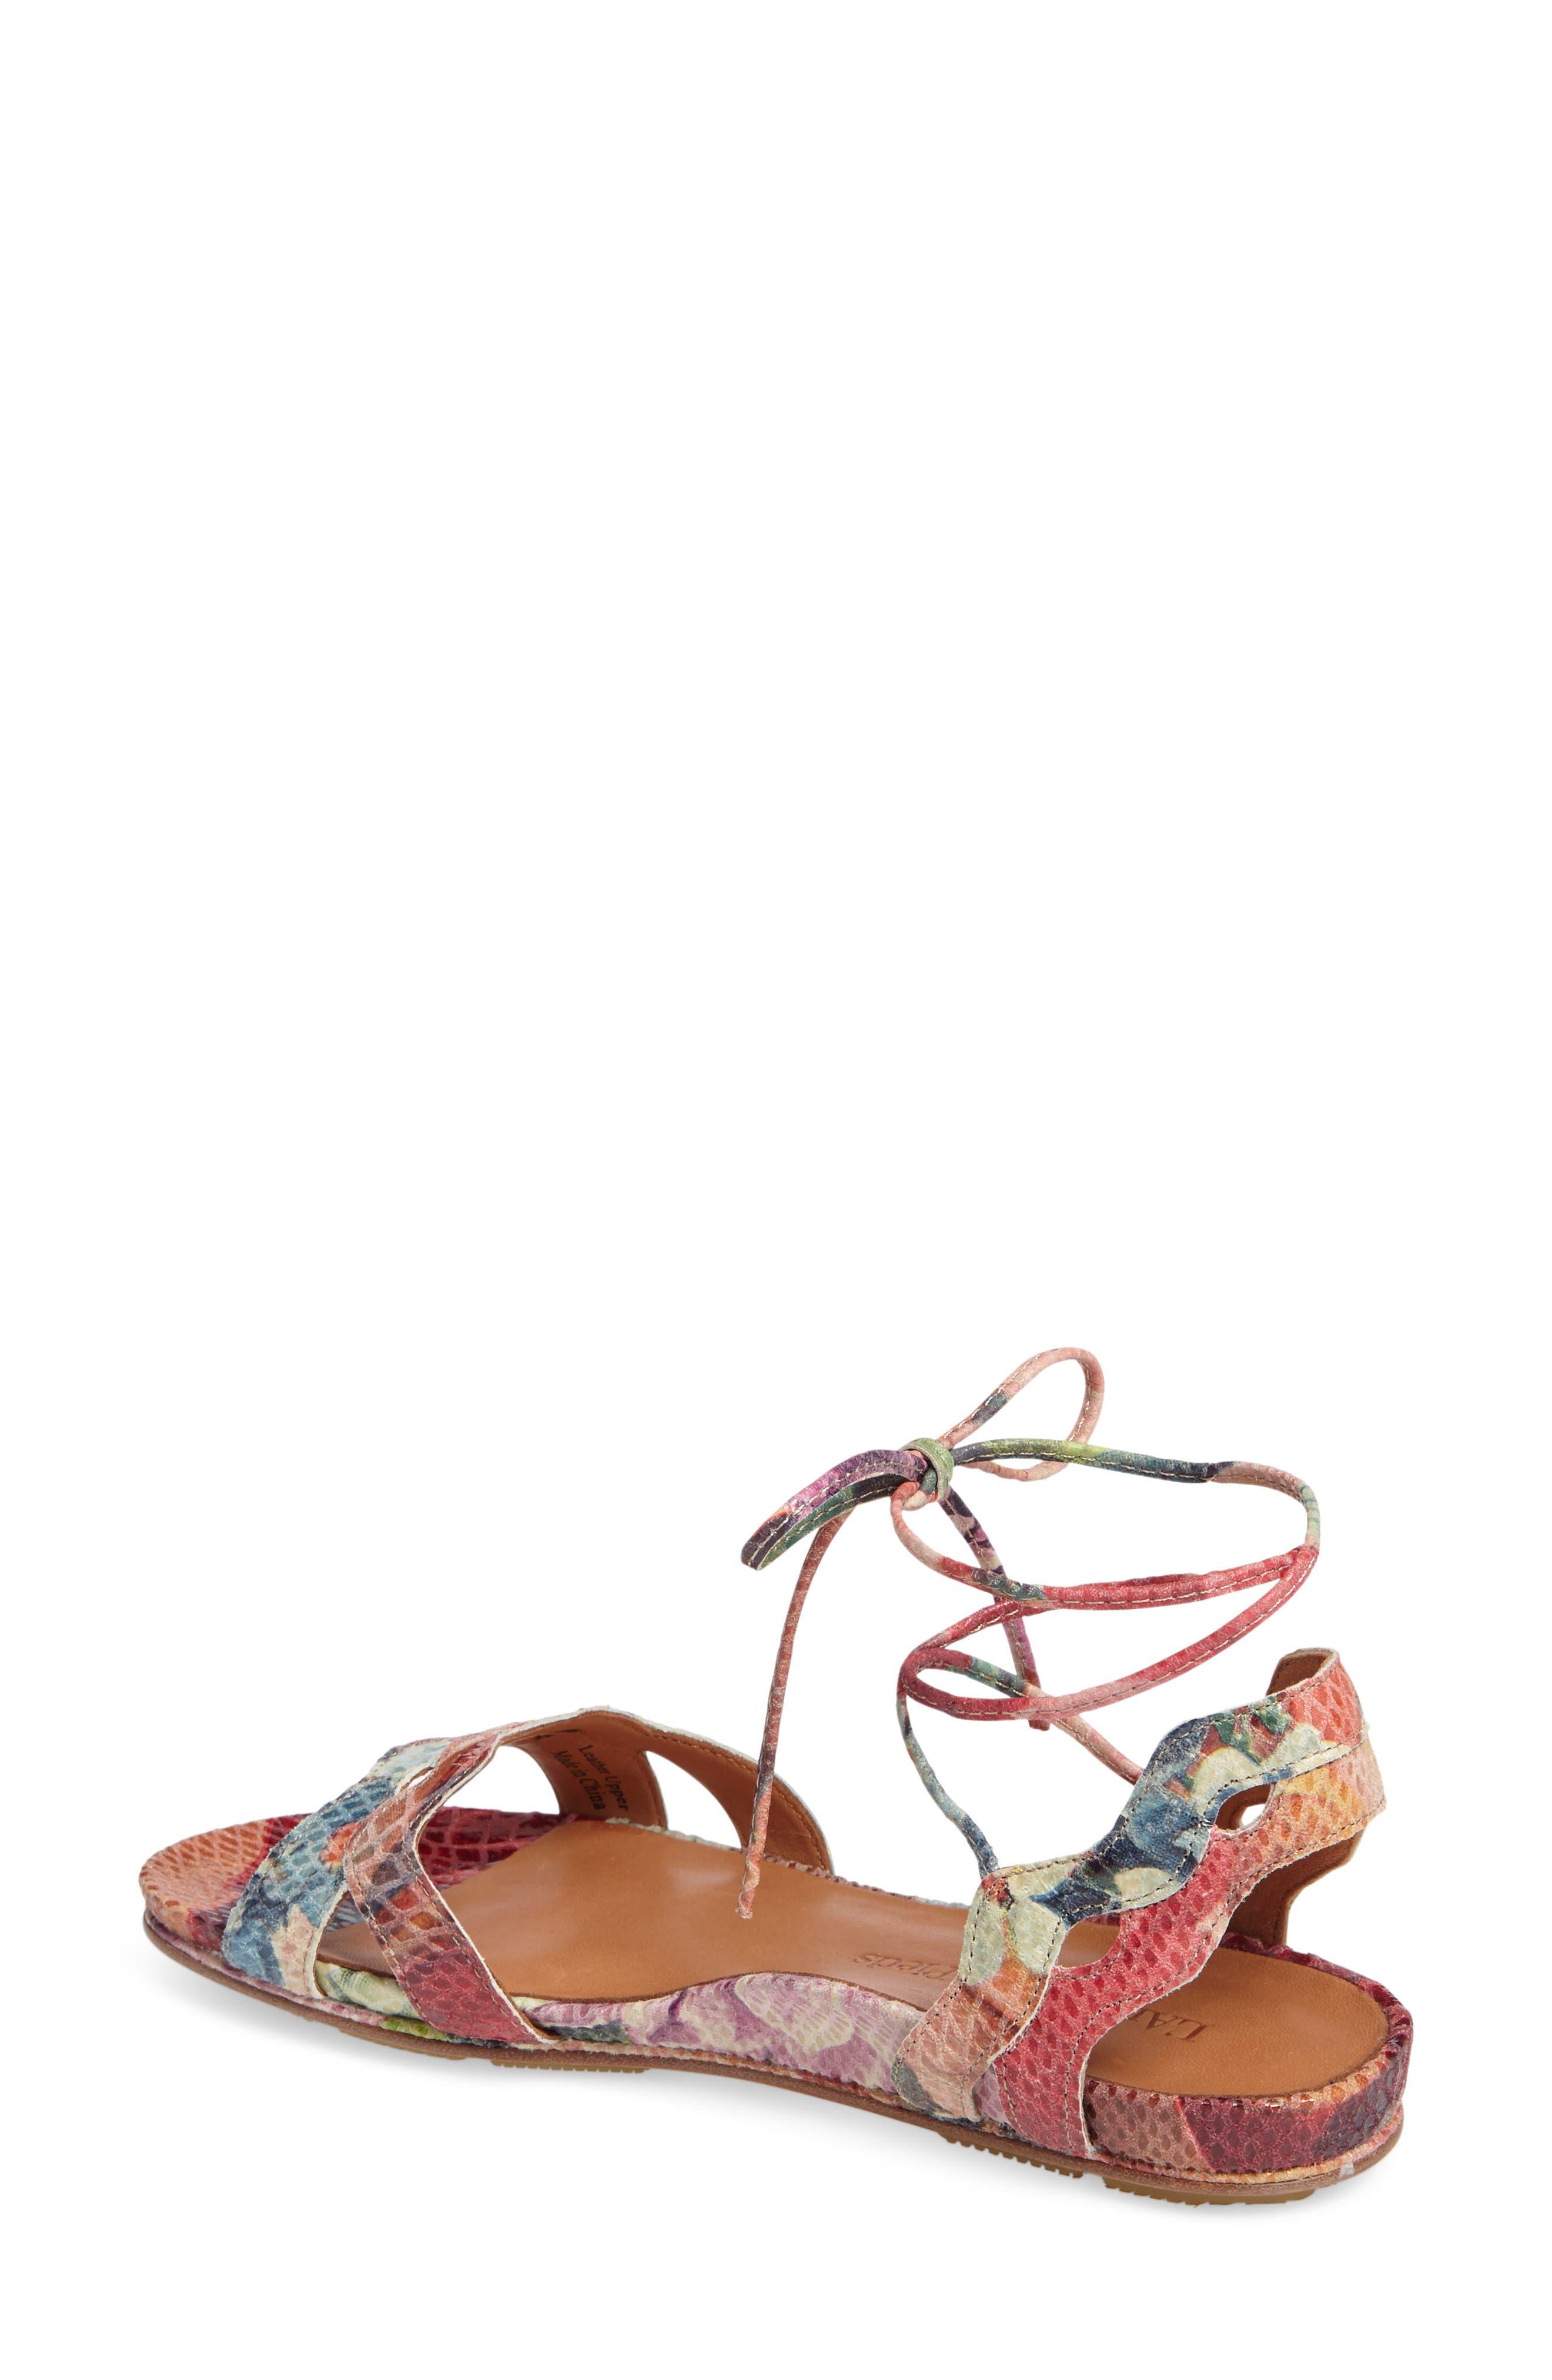 Darrylynn Wraparound Lace-Up Sandal,                             Alternate thumbnail 4, color,